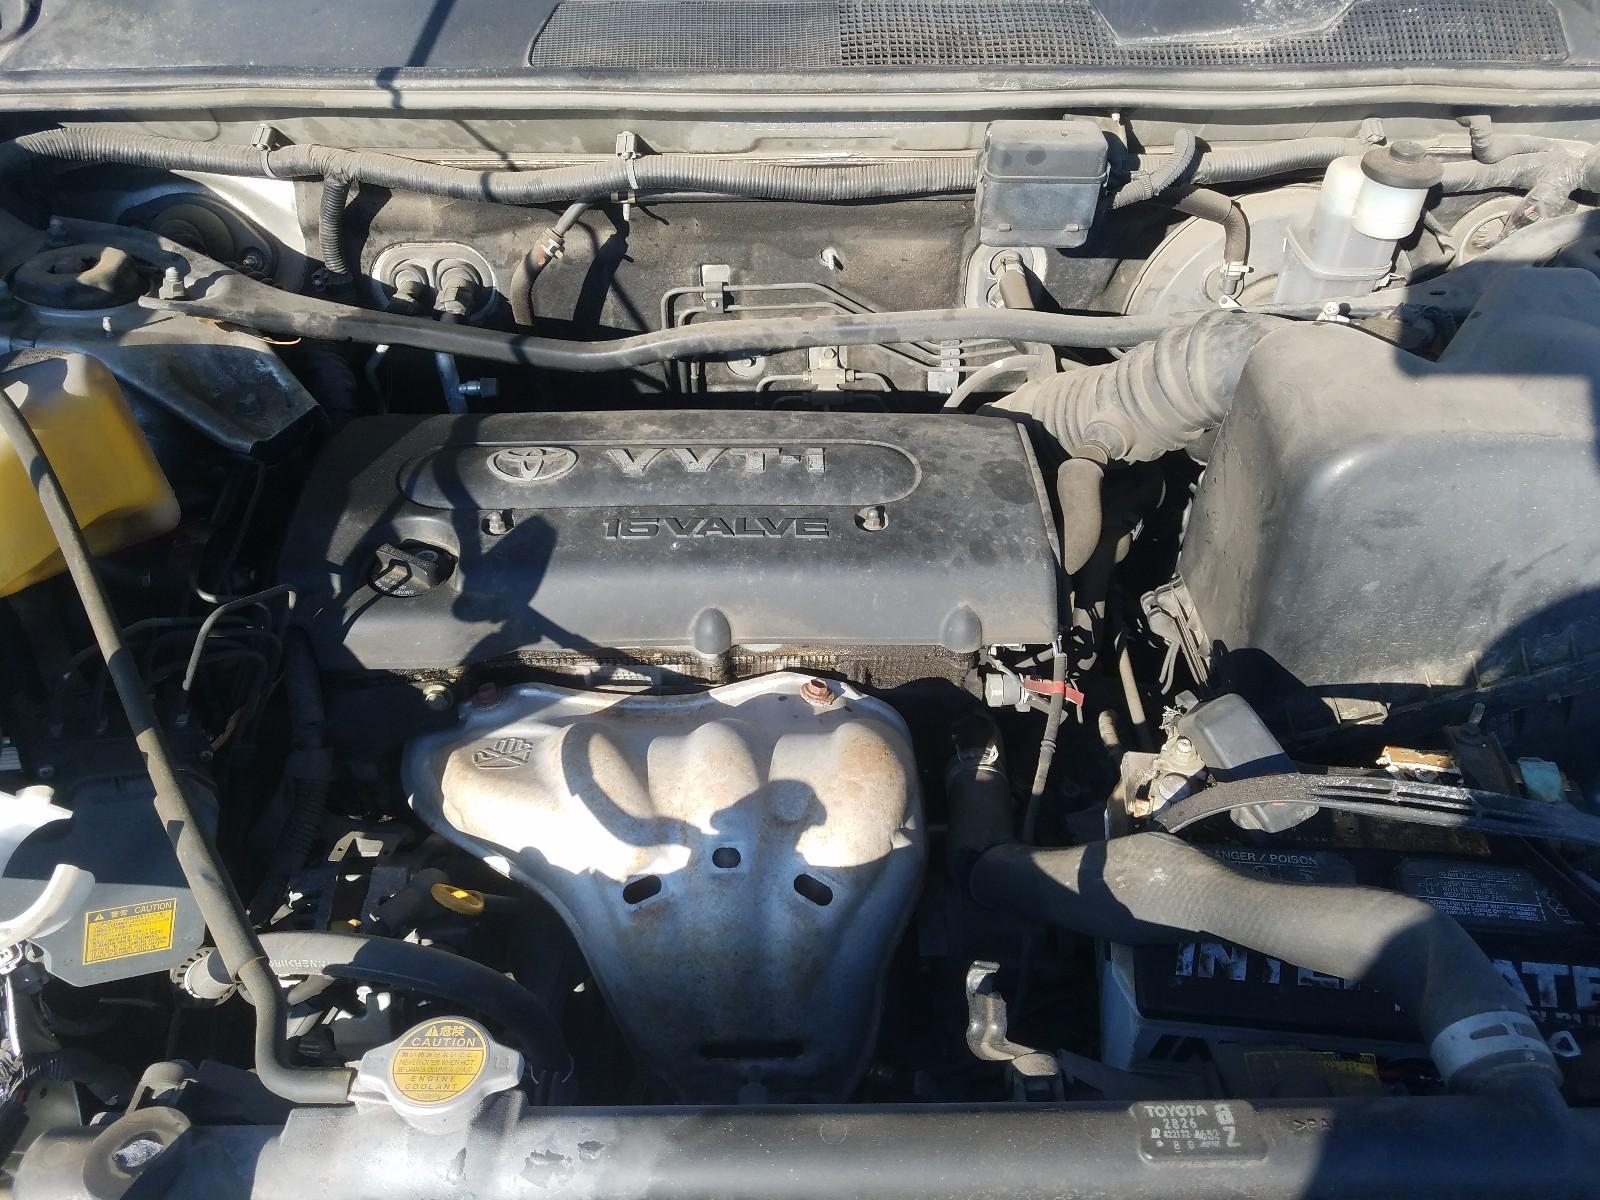 JTEGD21A060132850 - 2006 Toyota Highlander 2.4L inside view